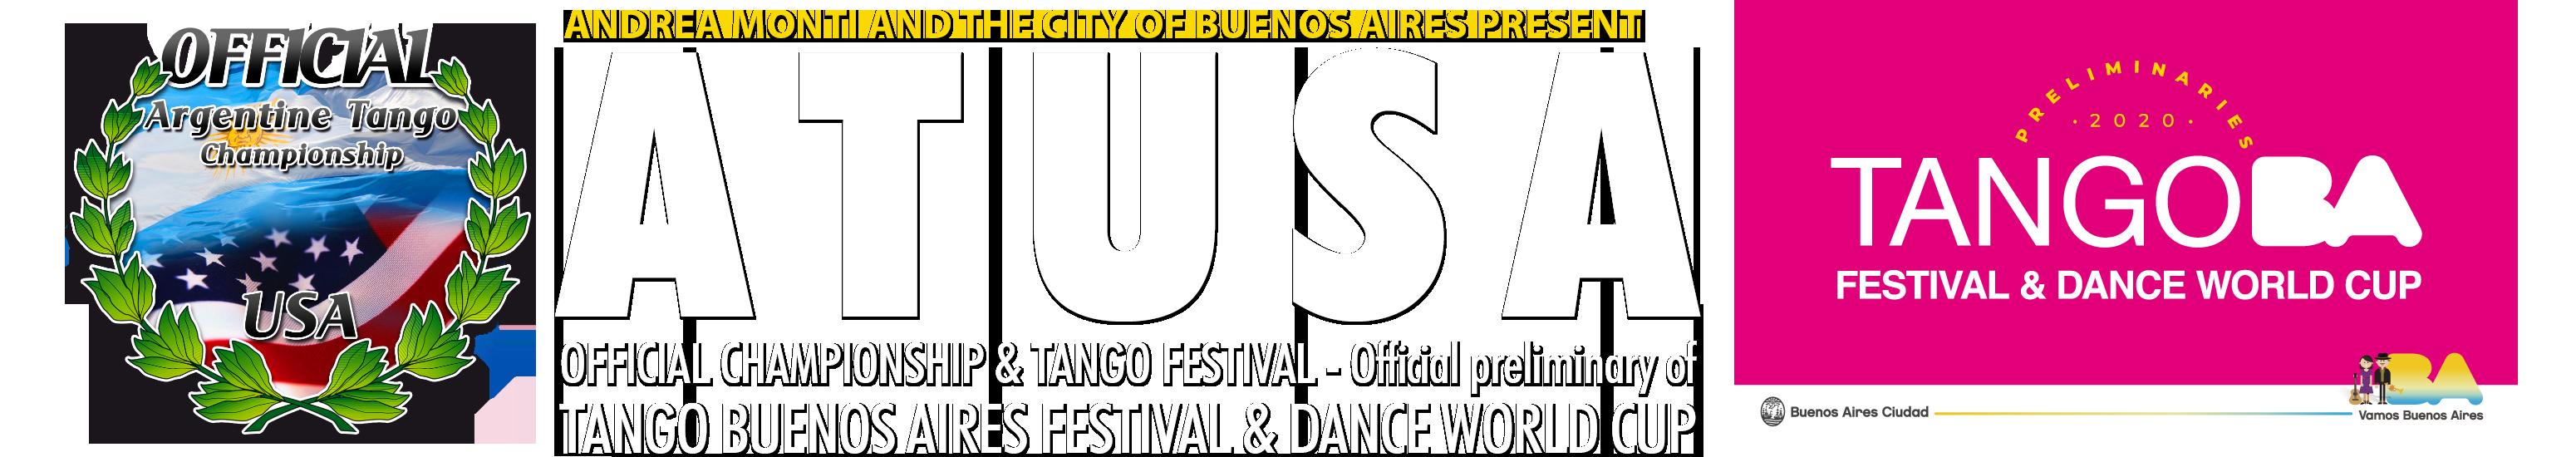 ARGENTINE TANGO U.S.A. Logo